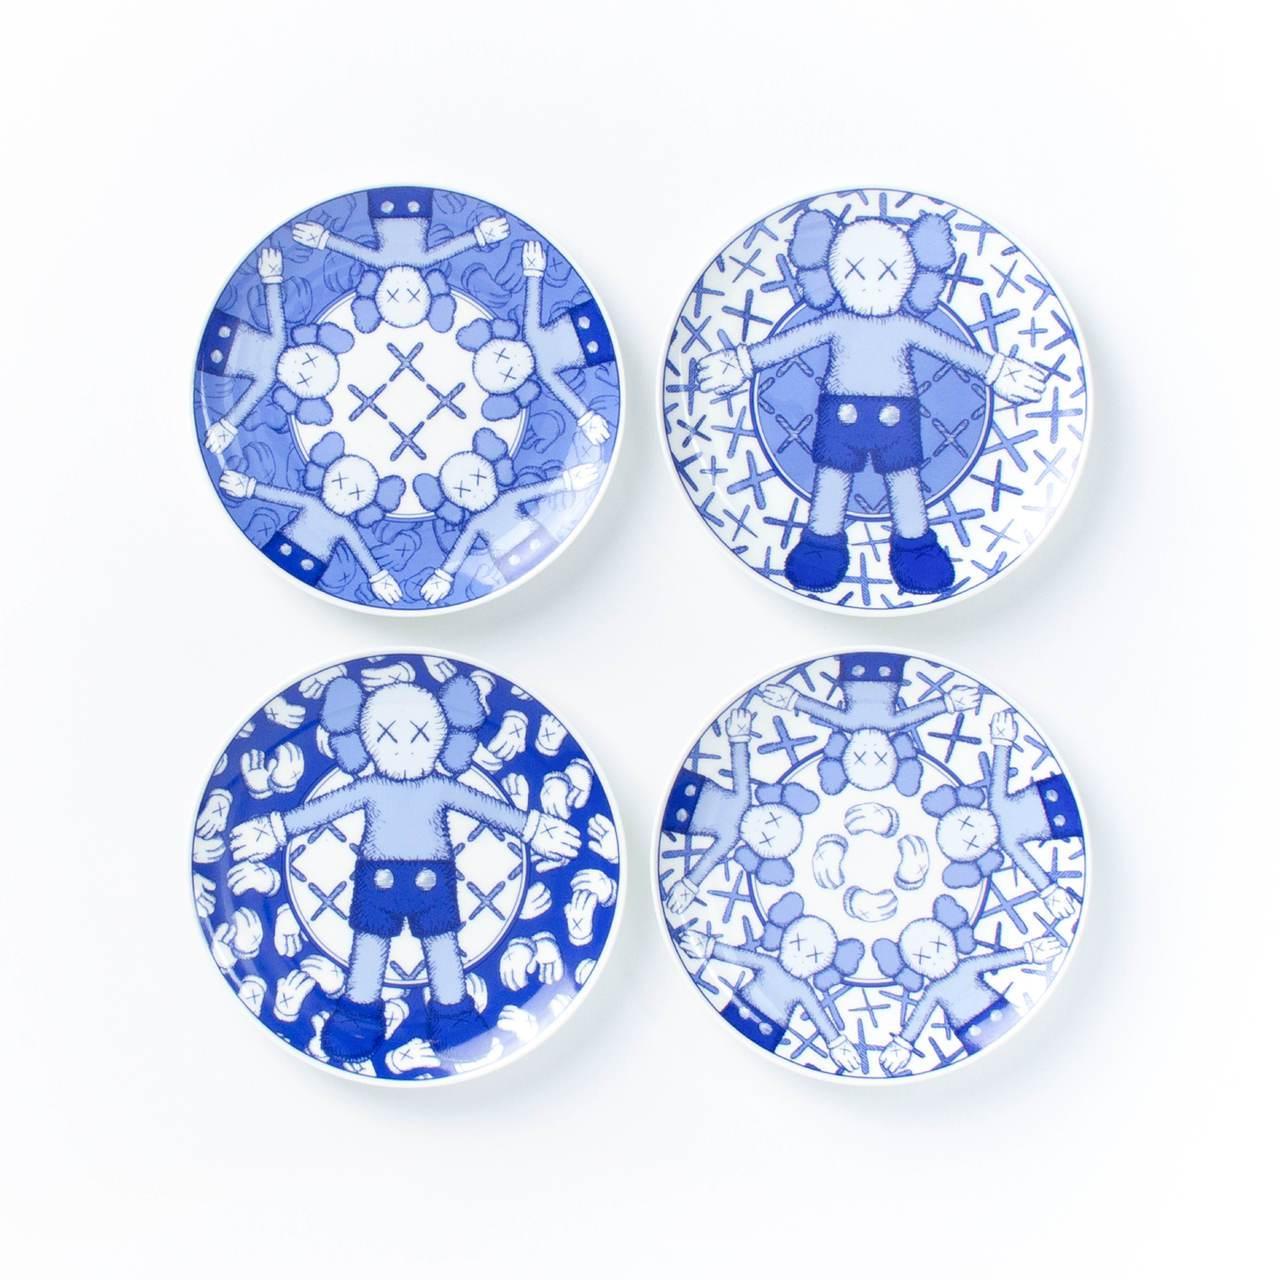 《KAWS:HOLIDAY Taipei》限量6吋骨瓷瓷碟4入套裝,售價4,10...